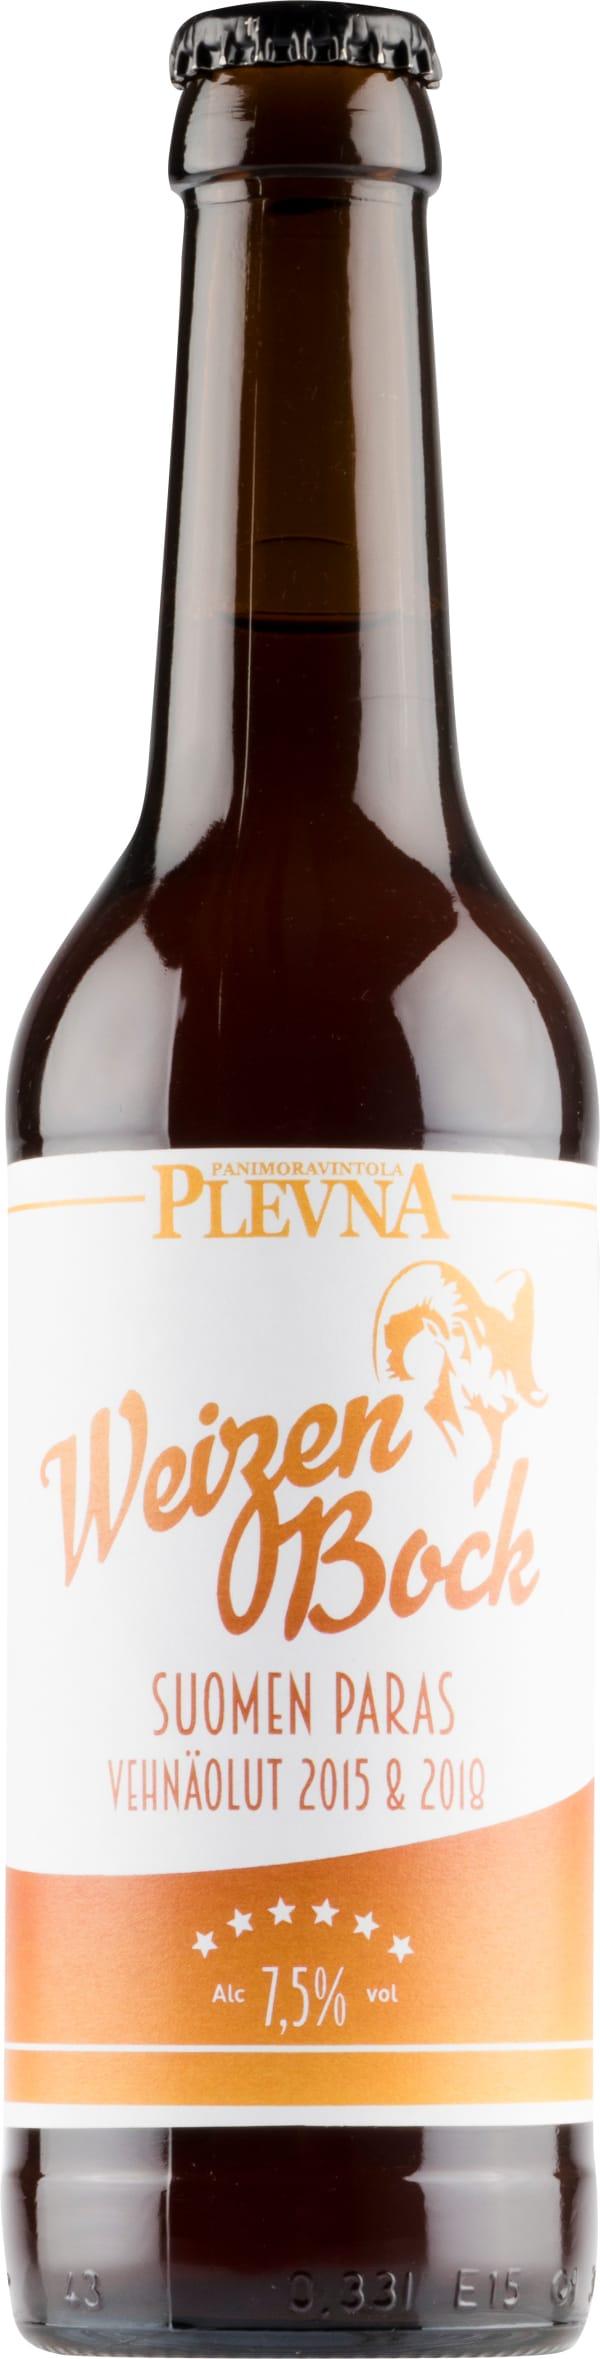 Plevna Weizenbock